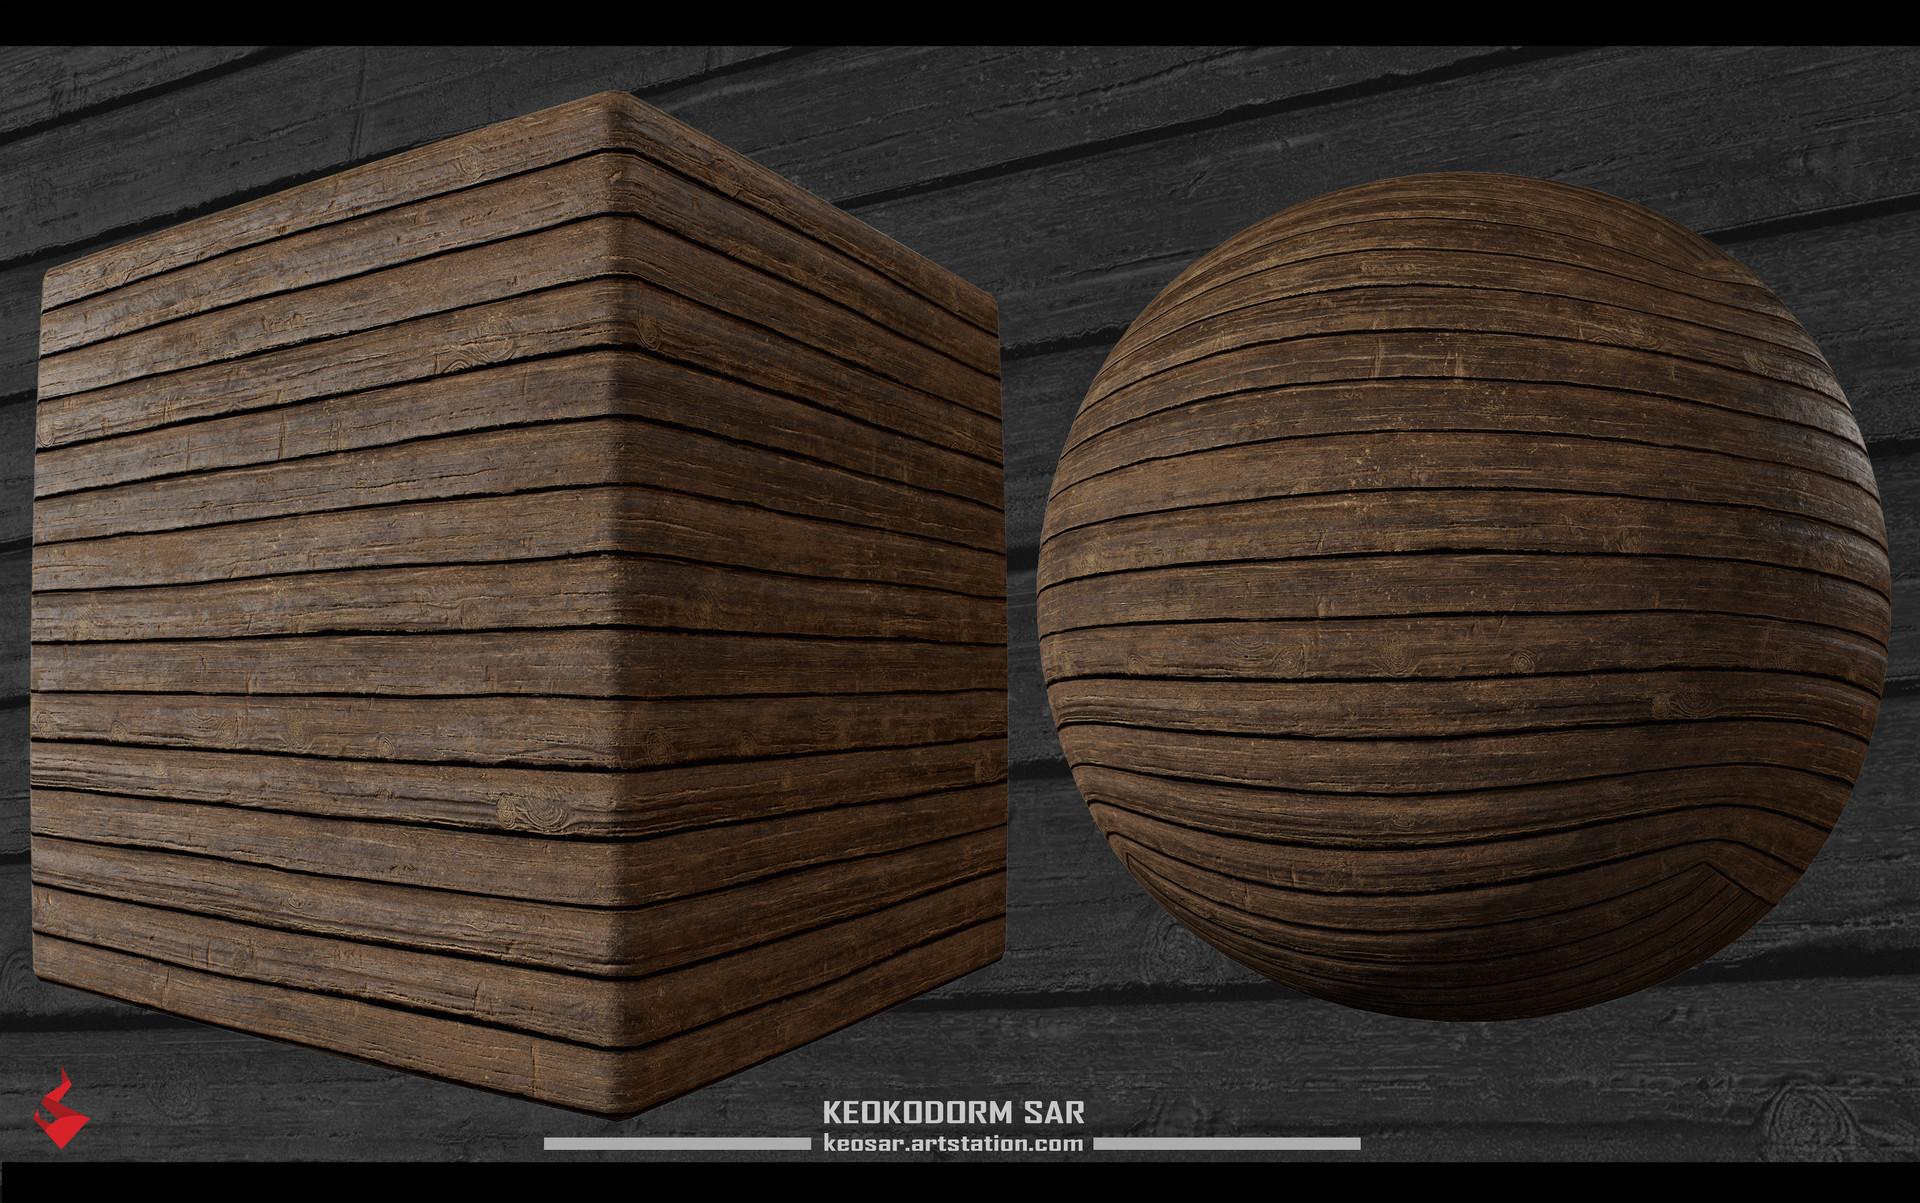 Keokodorm sar keosar wood a